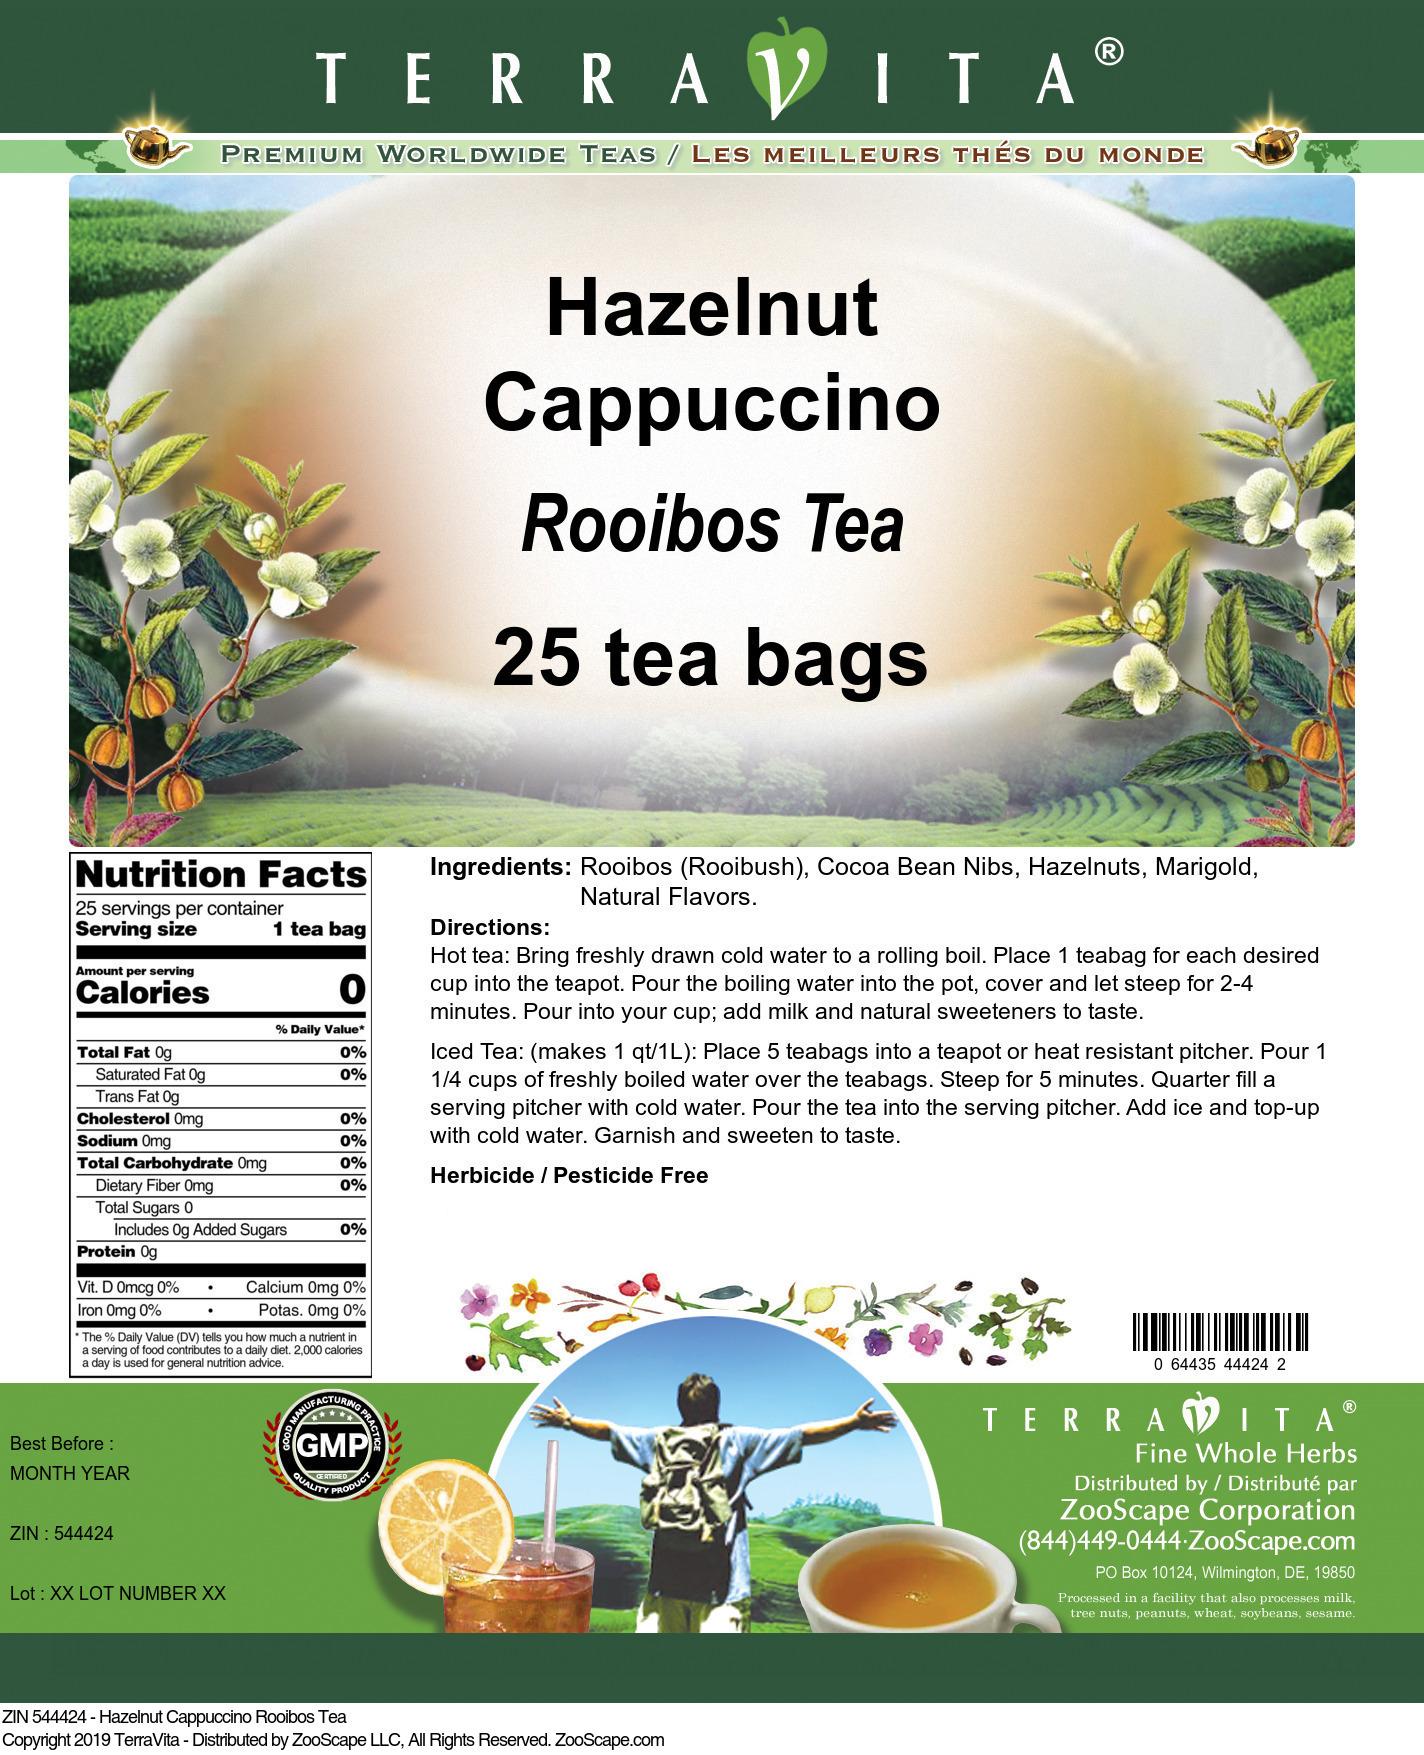 Hazelnut Cappuccino Rooibos Tea